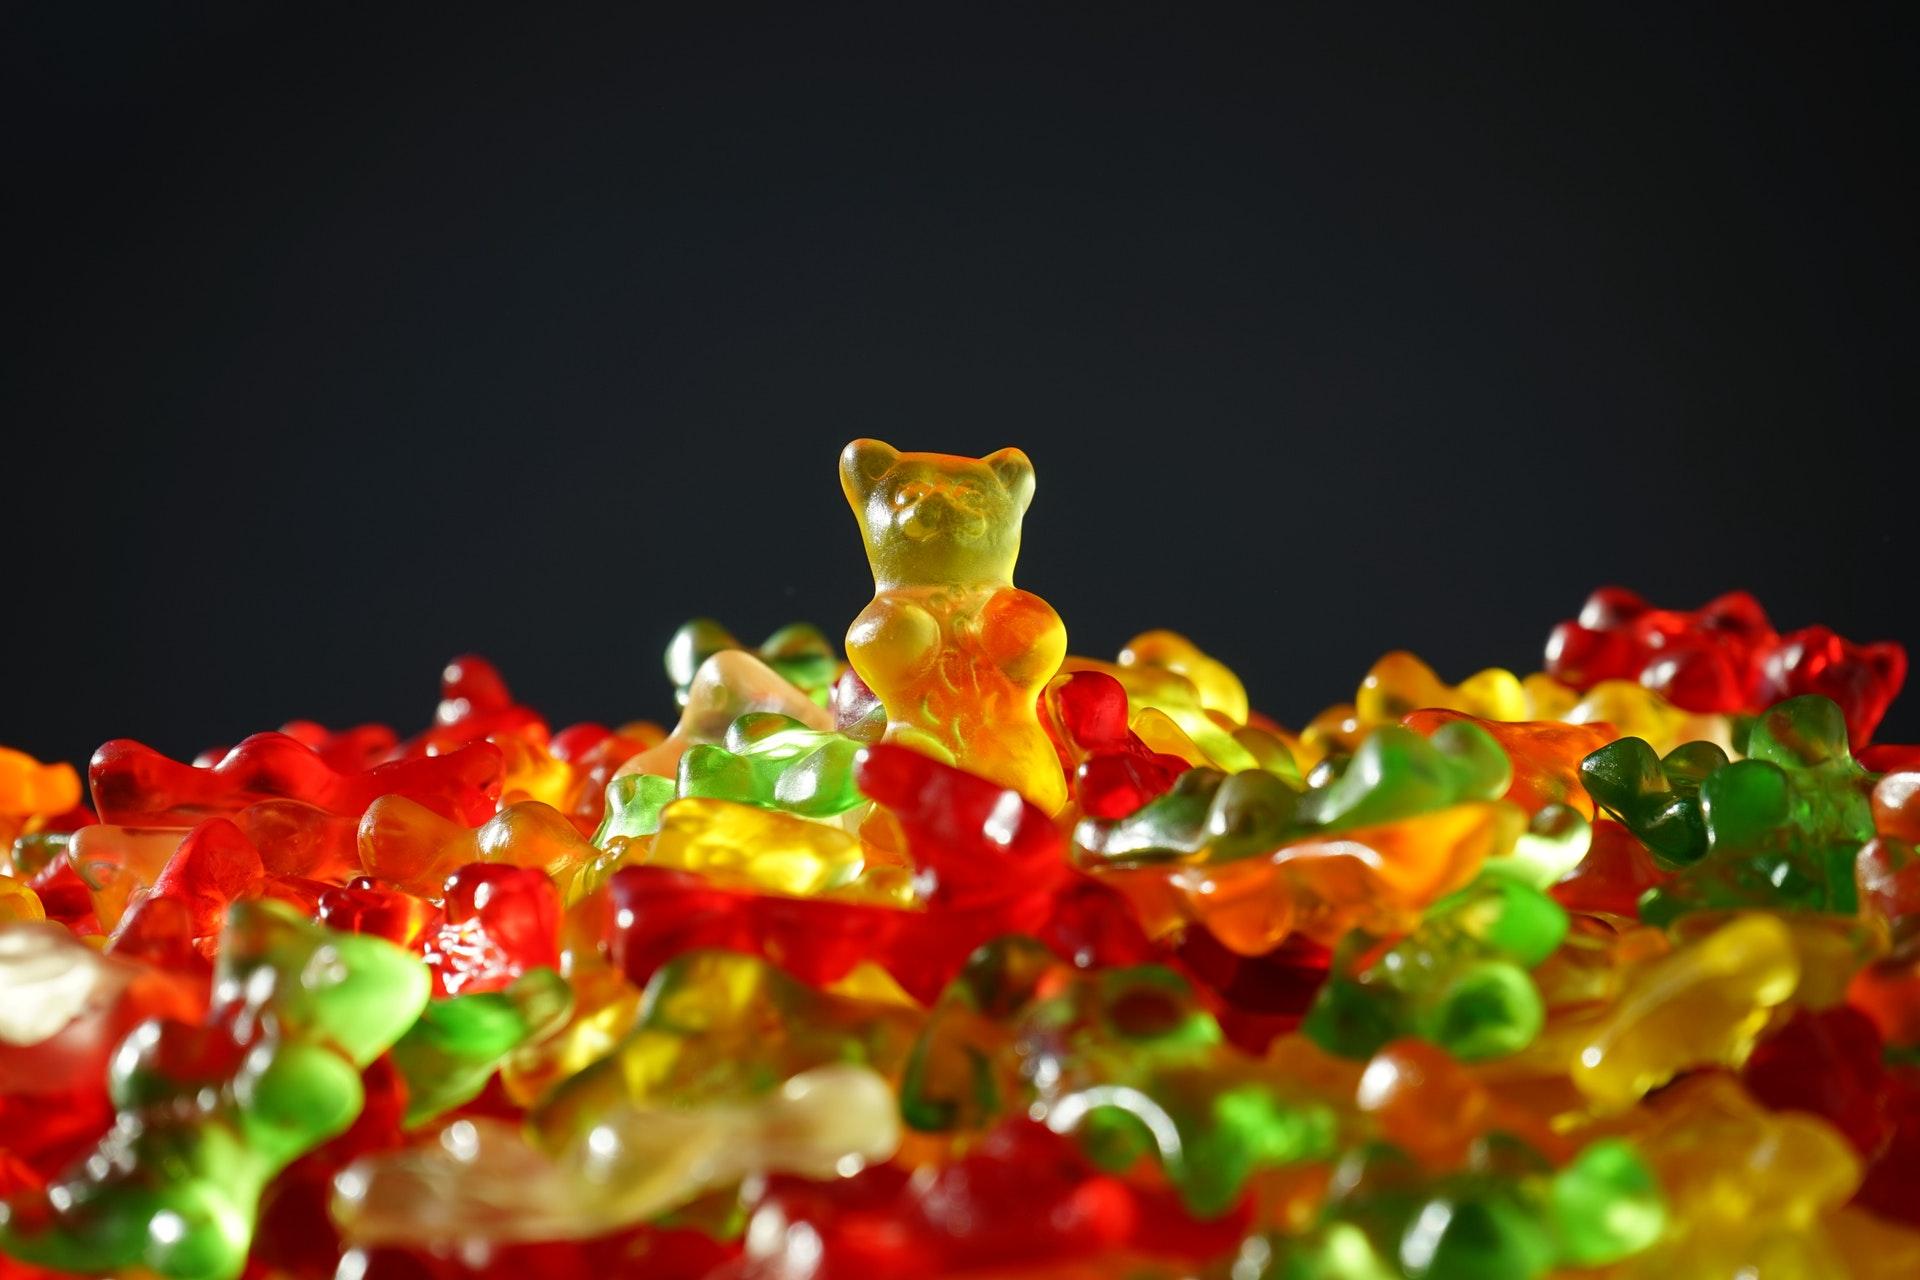 gold-bear-gummi-bears-bear-yellow-55825.jpeg